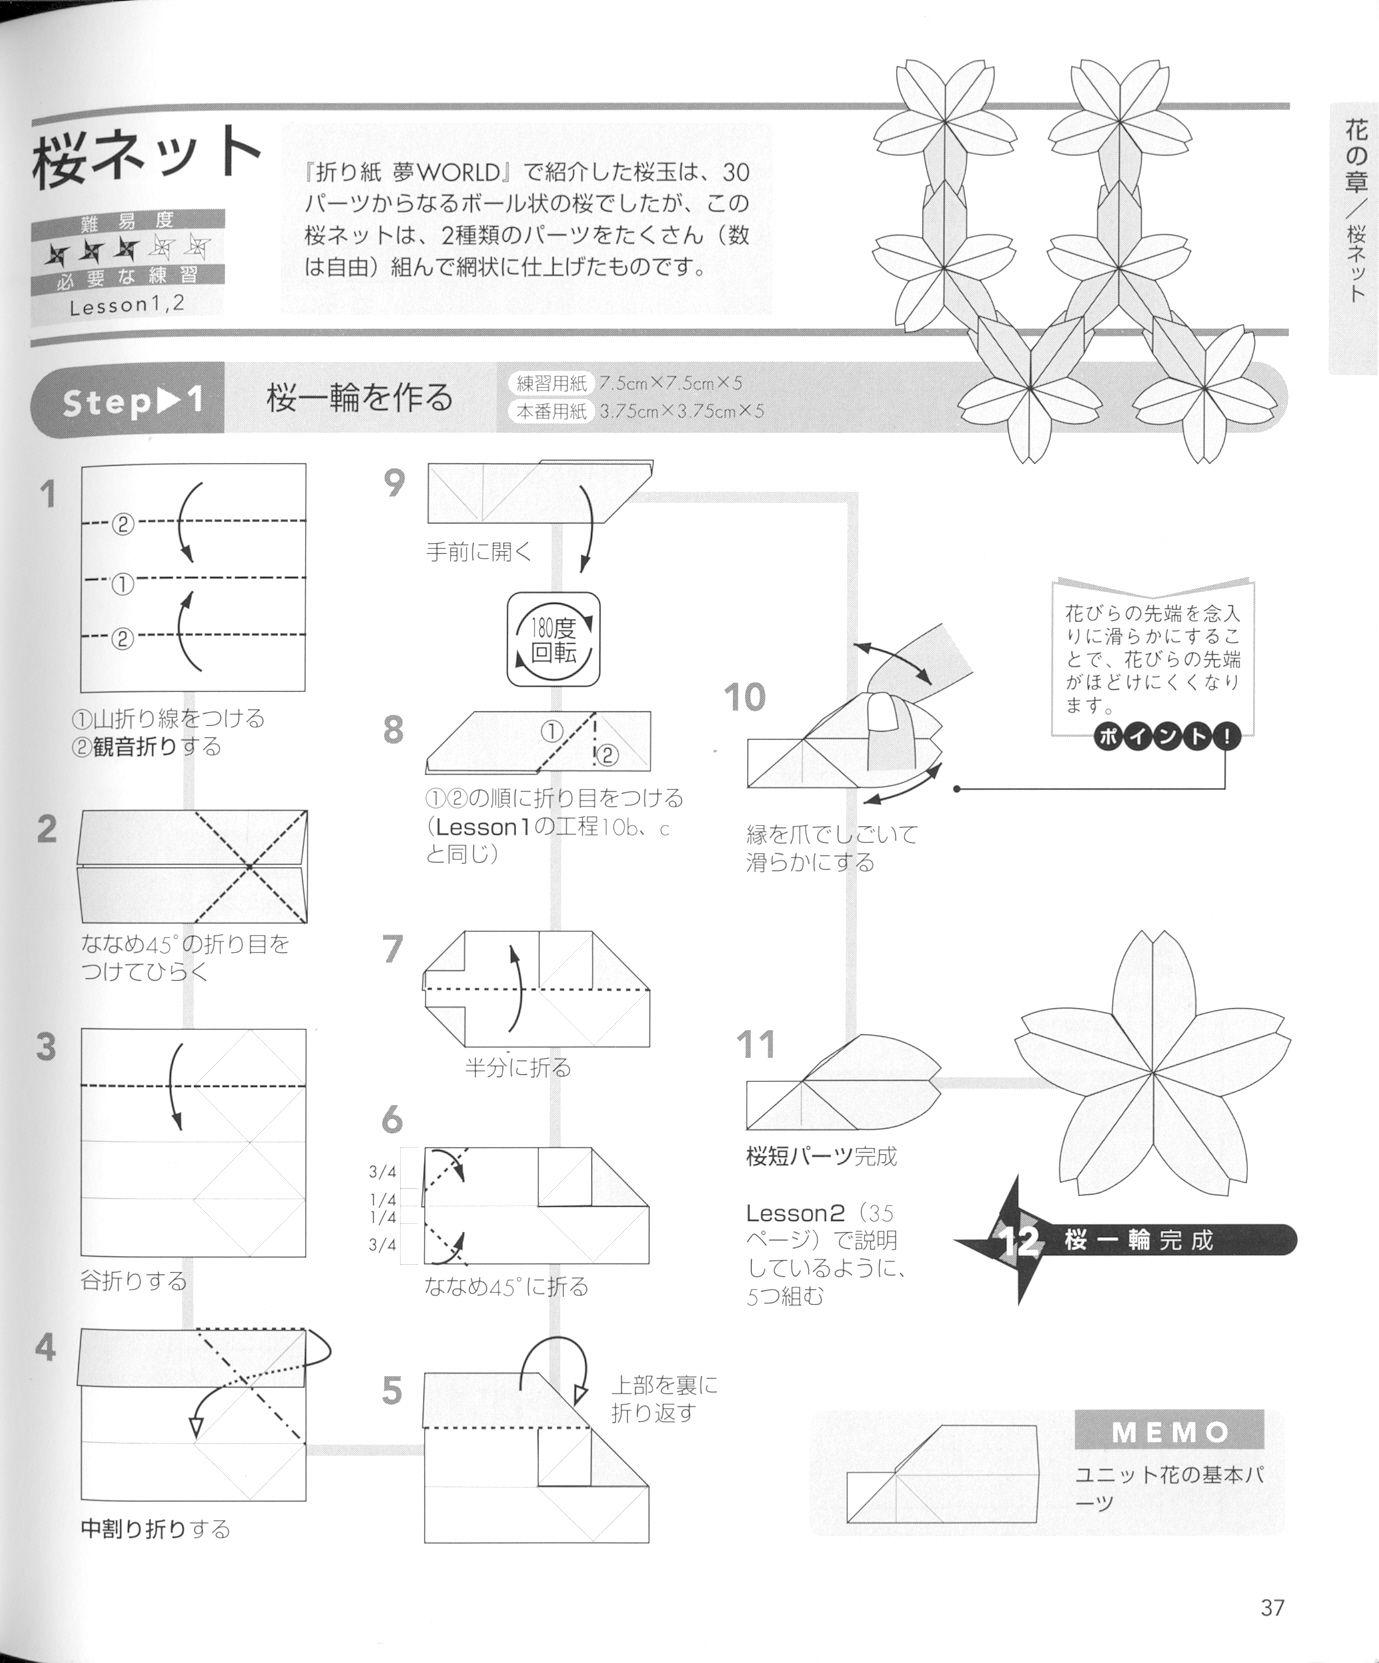 Origami Flower Instruction Diagram Wiring For Car Radio Cherry Blossom Japanese By Kawasaki